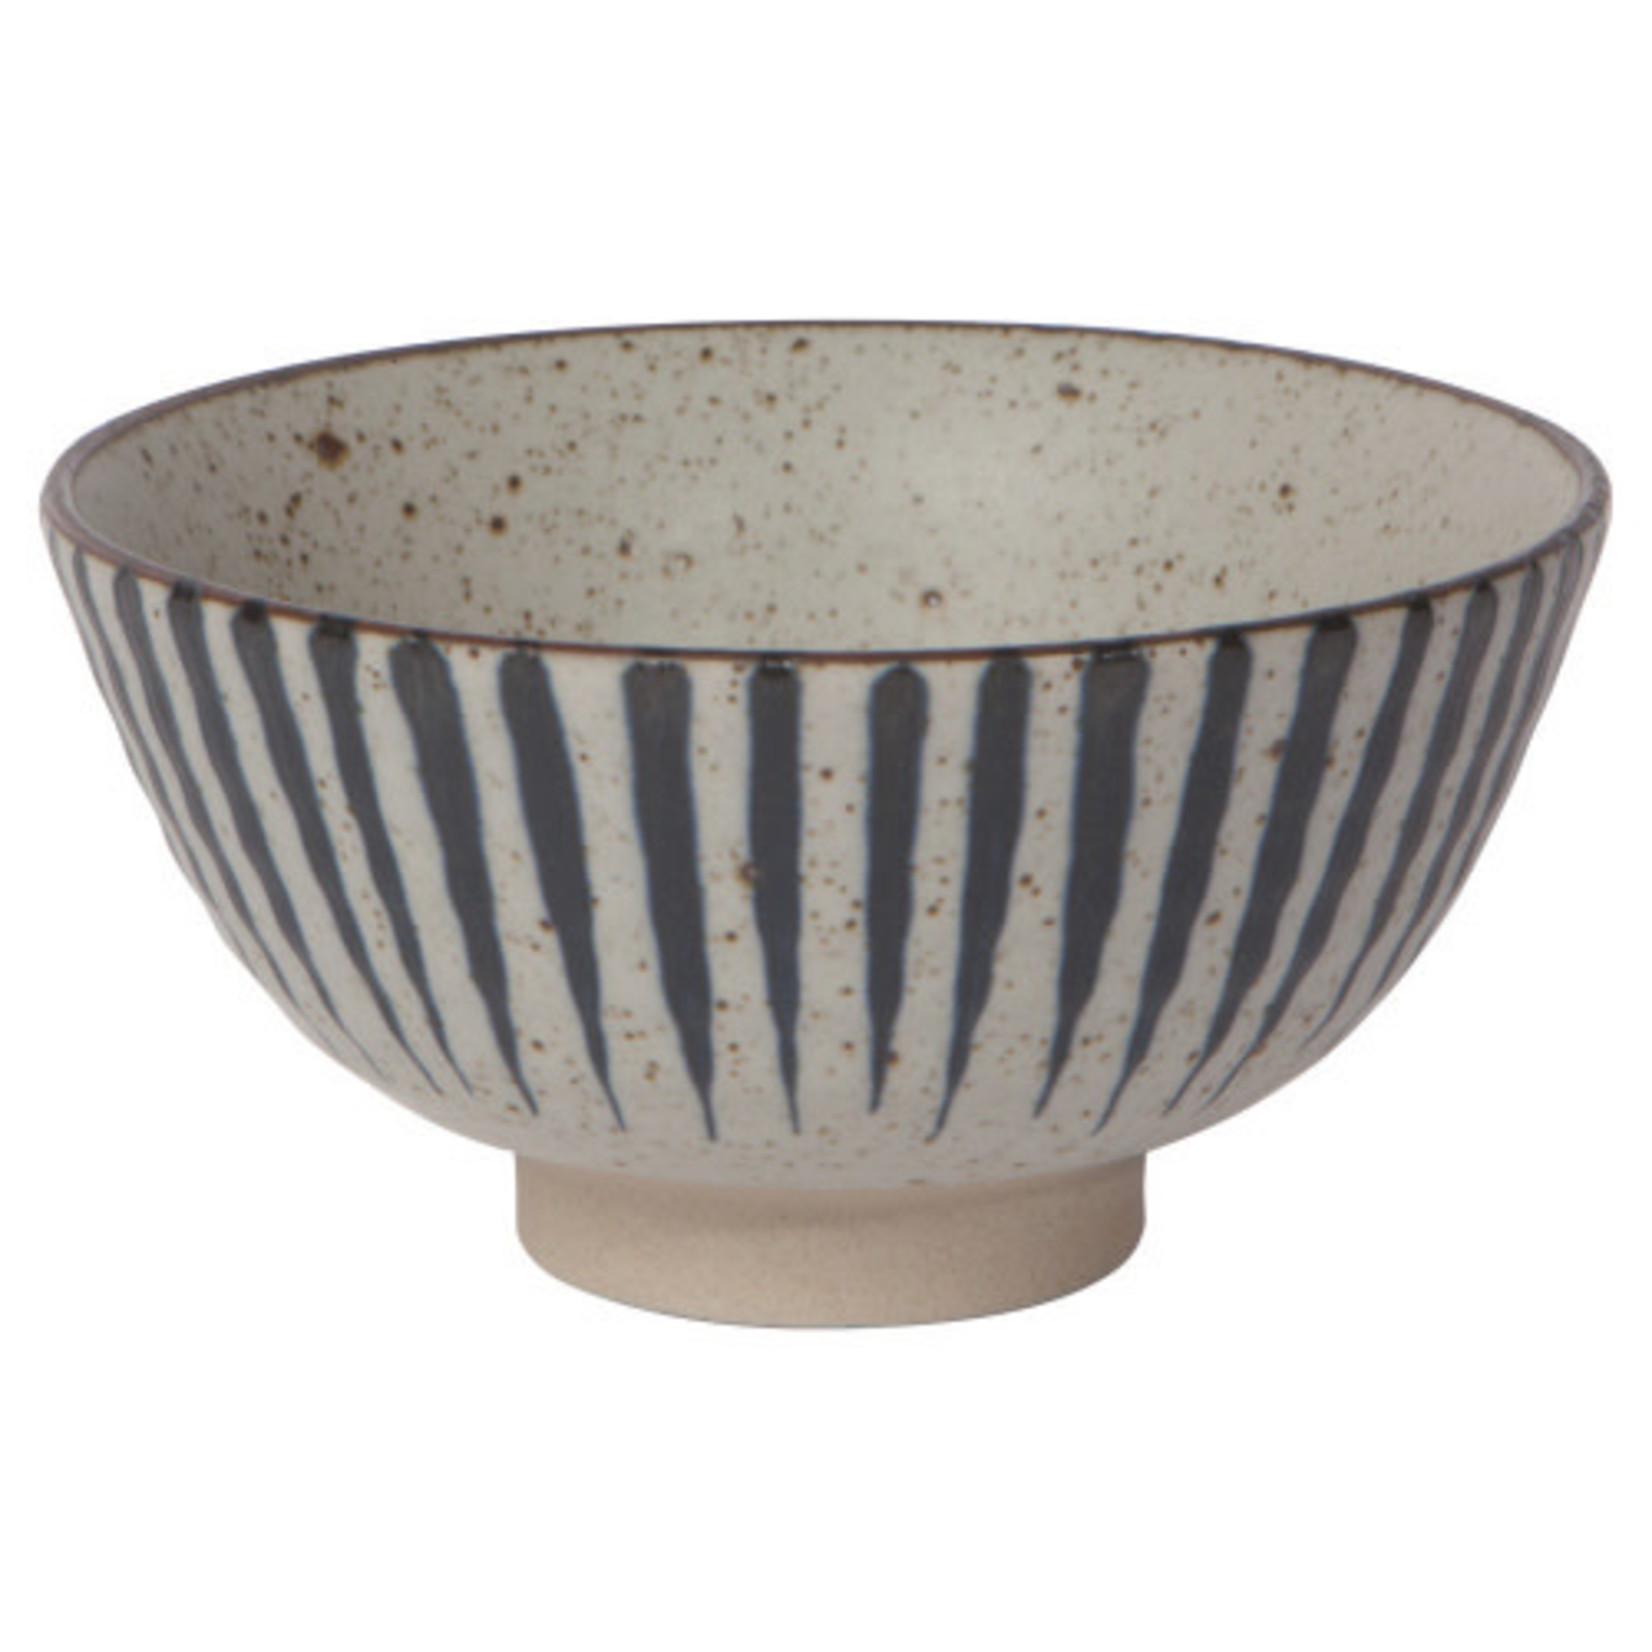 "Danica 6"" bowls"